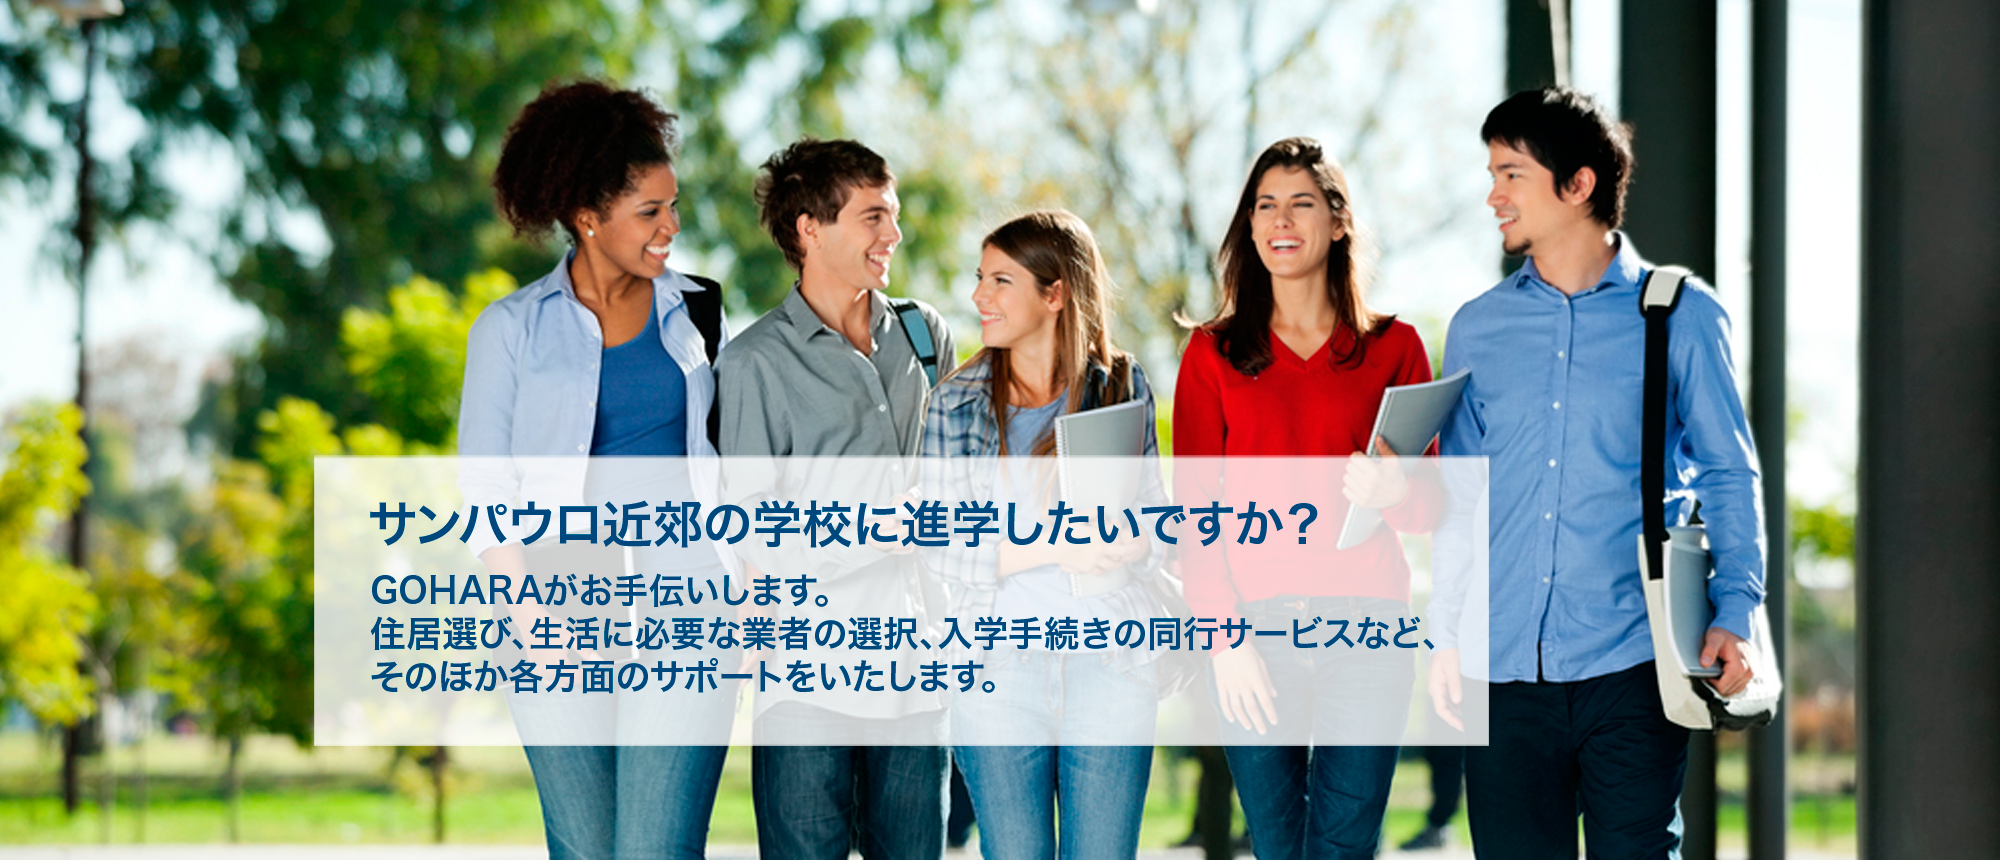 gohara-banner3-JP